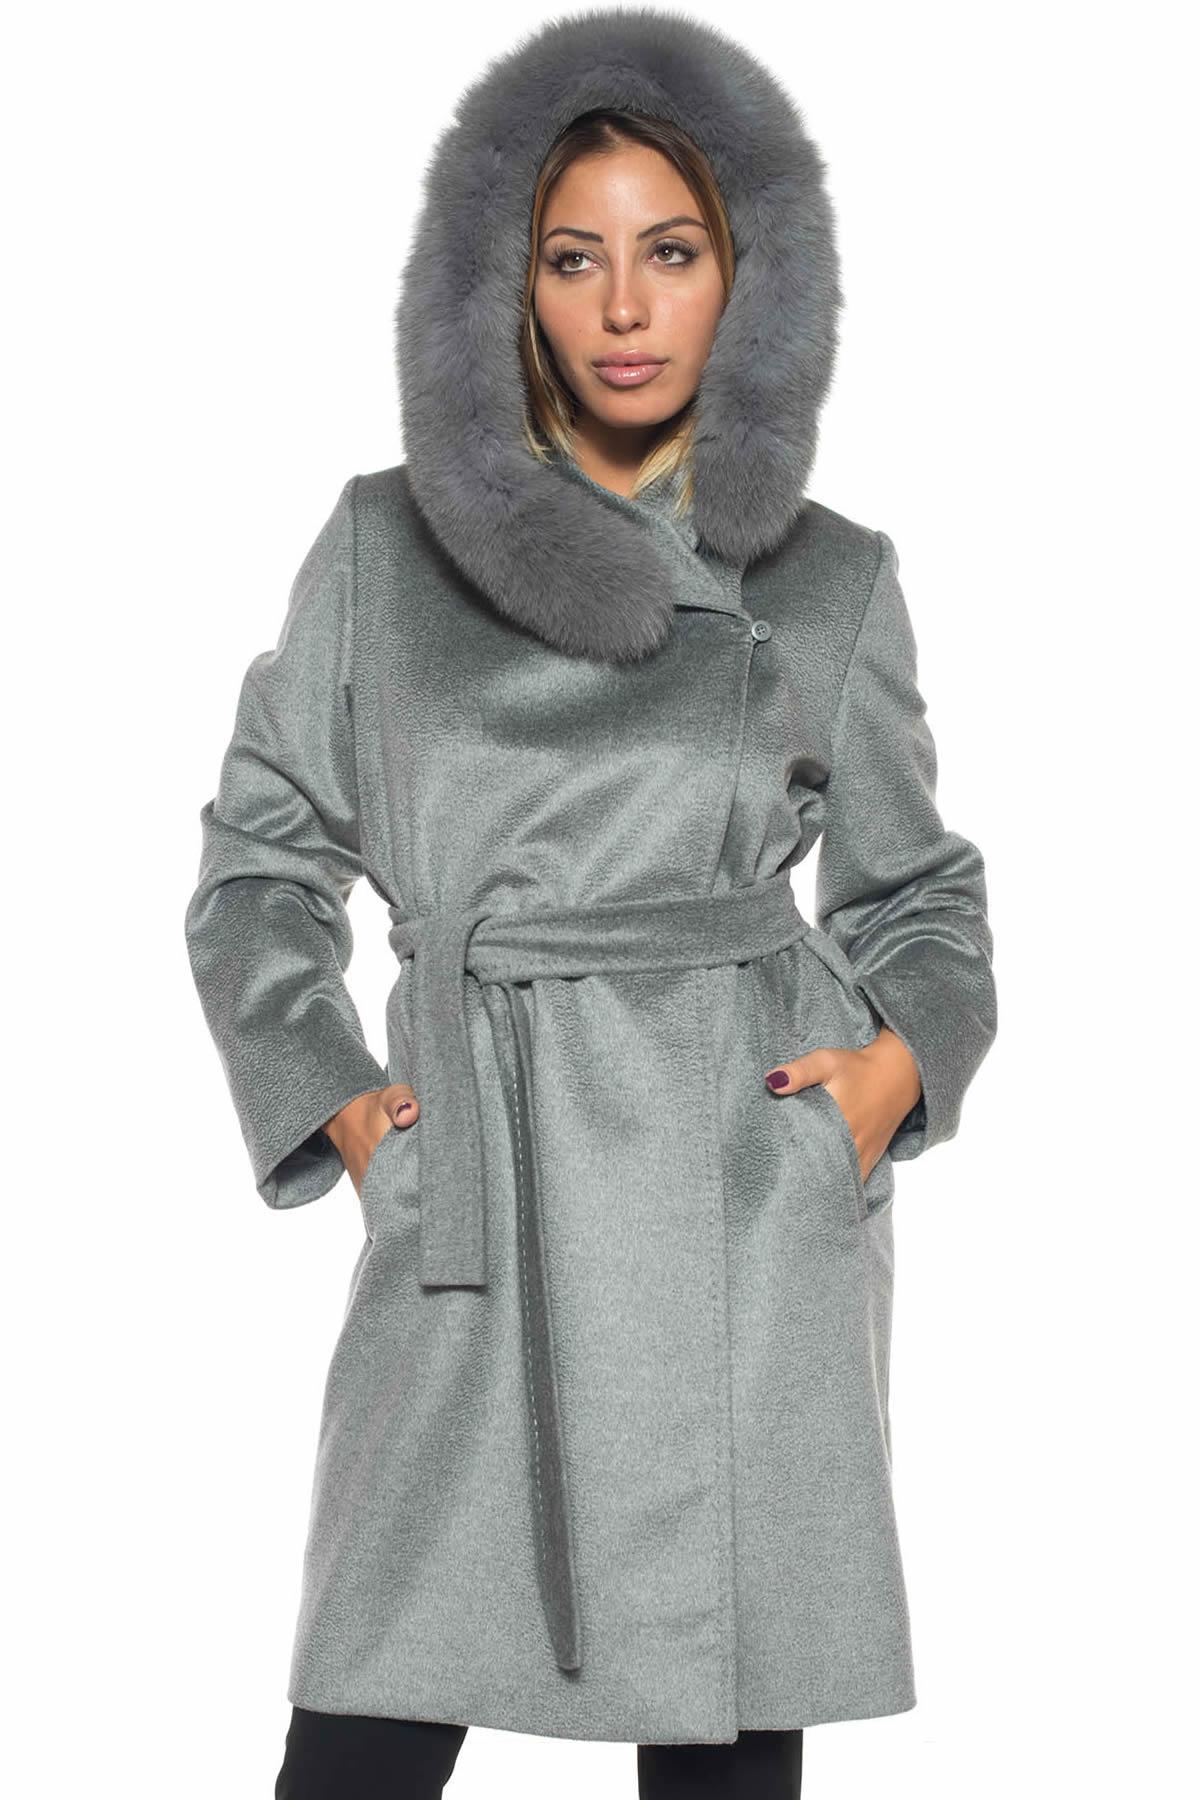 Cappotto lungo - Max Mara studio - ScaglioneIschia 3d5c3c60c46